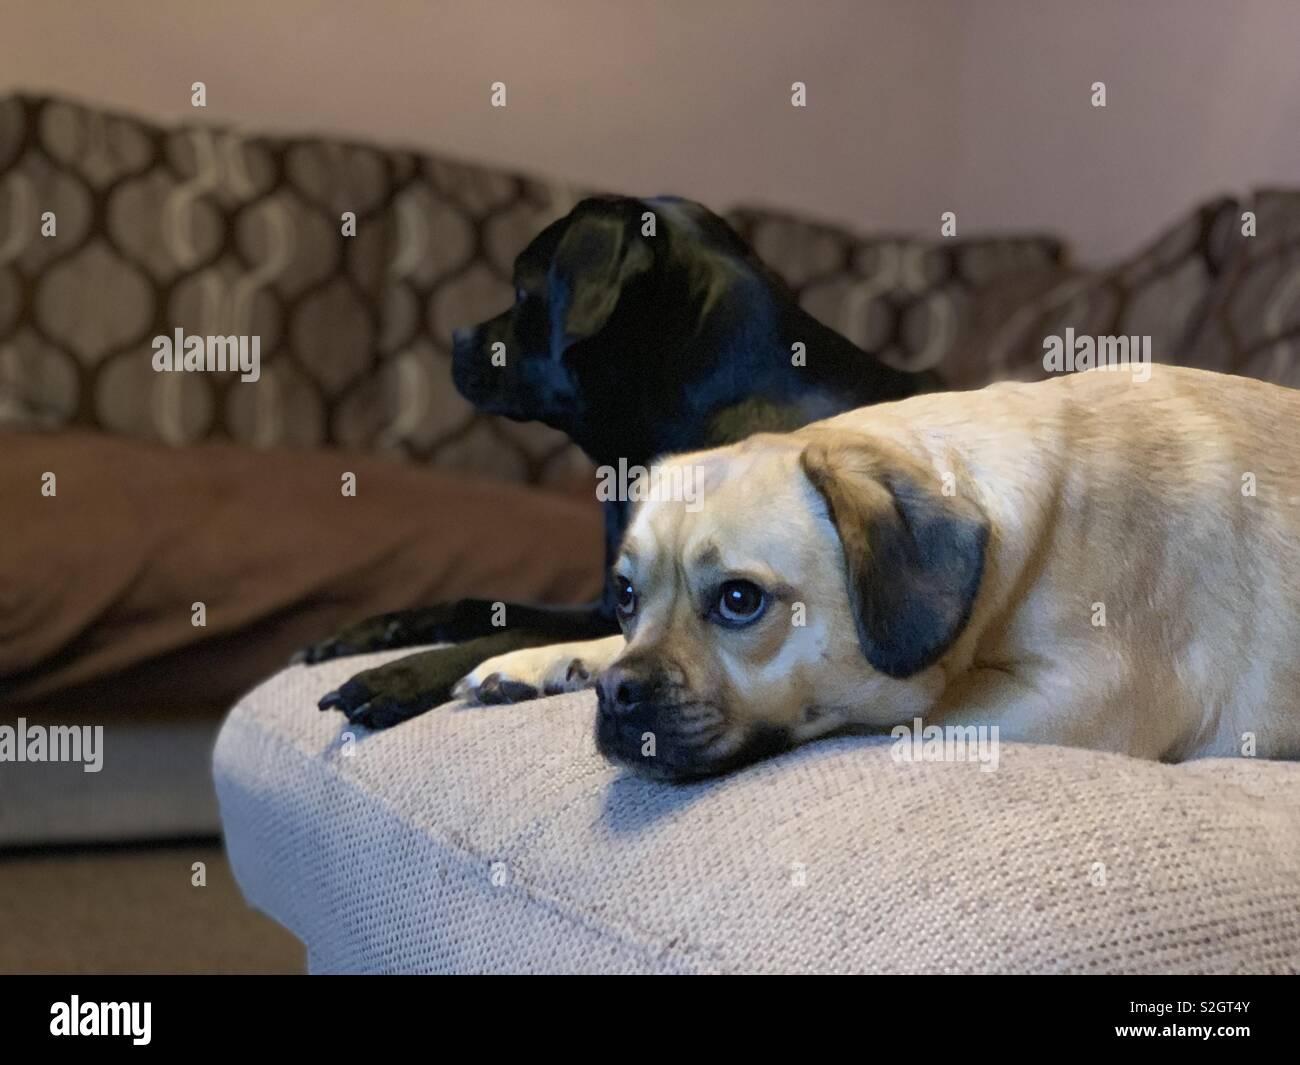 Fawn coloured Puggle dog lying down next to a black Puggle dog - Stock Image